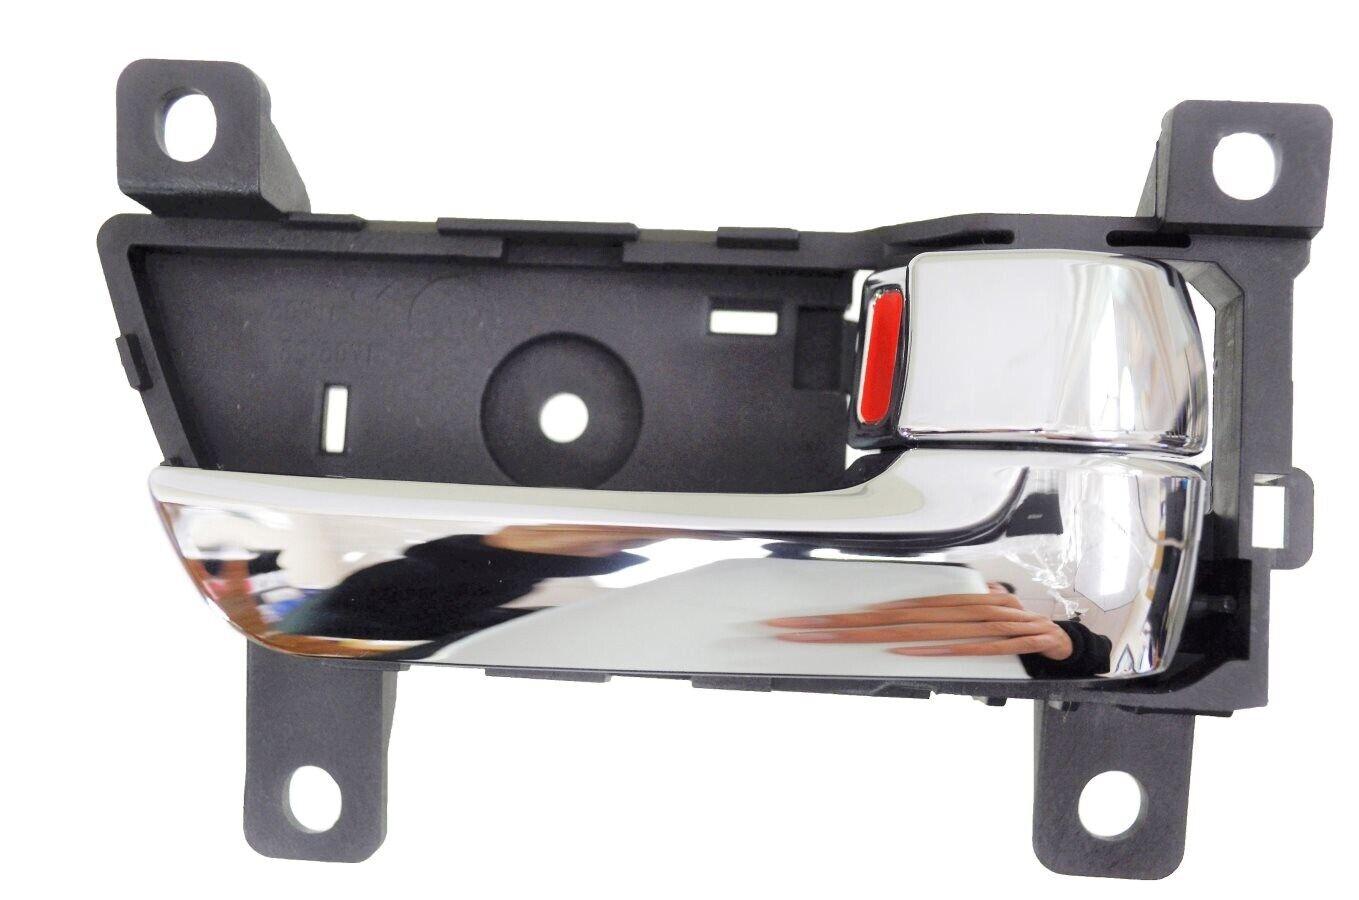 INEEDUP Door Handle Replacement for 2011-2015 Kia Sorento Exterior Rear Passenger Right Side Chrome